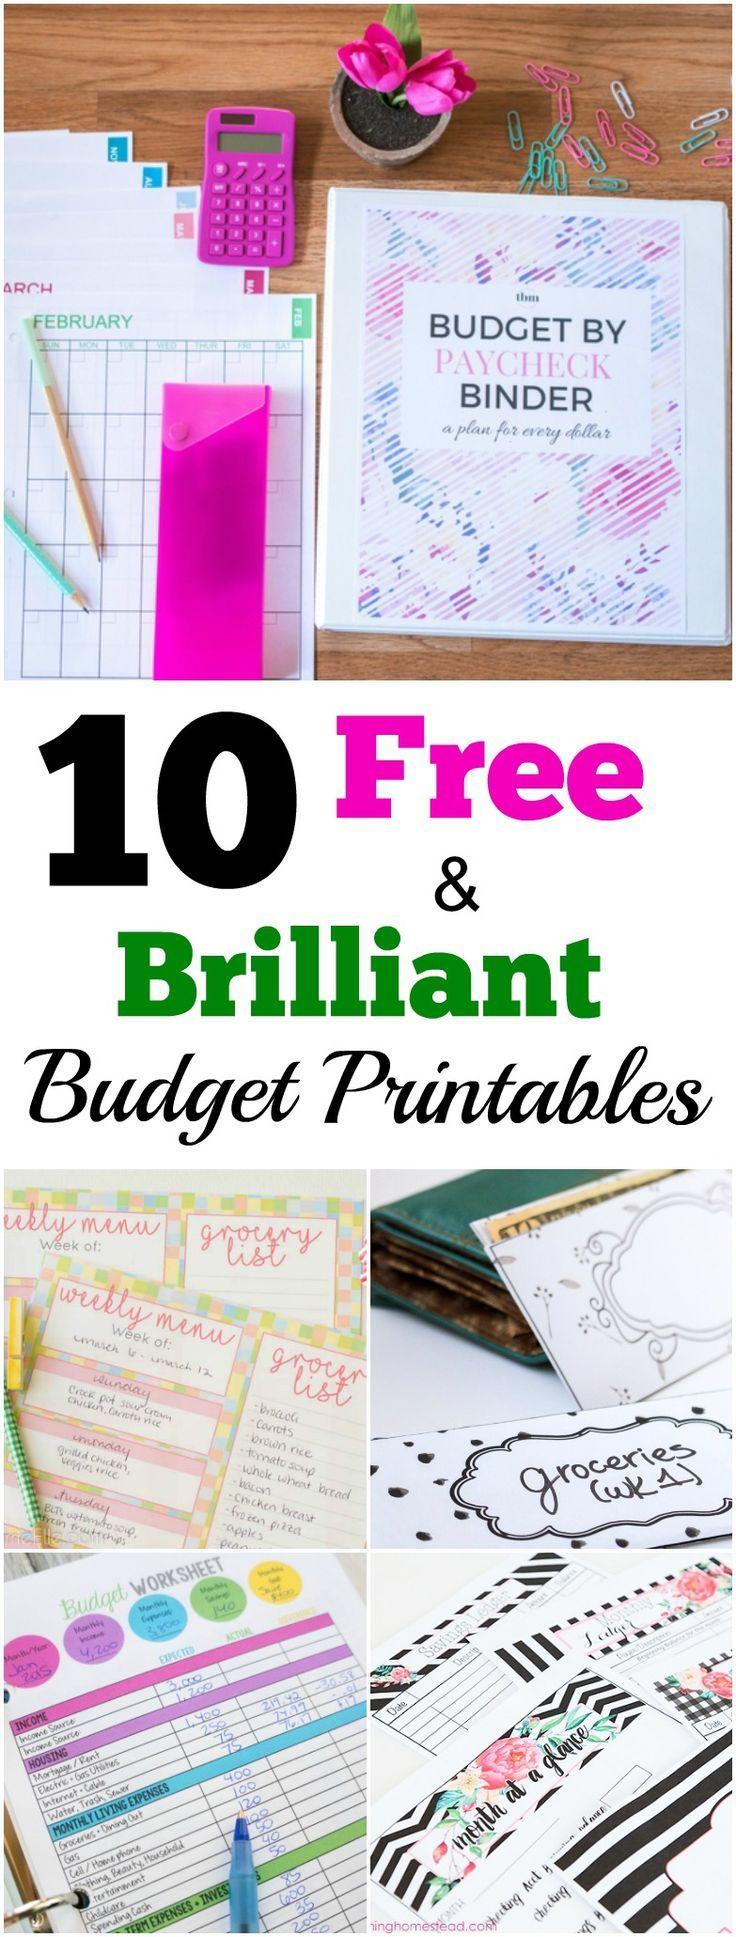 33 best Home Management/Money Printables images on Pinterest ...